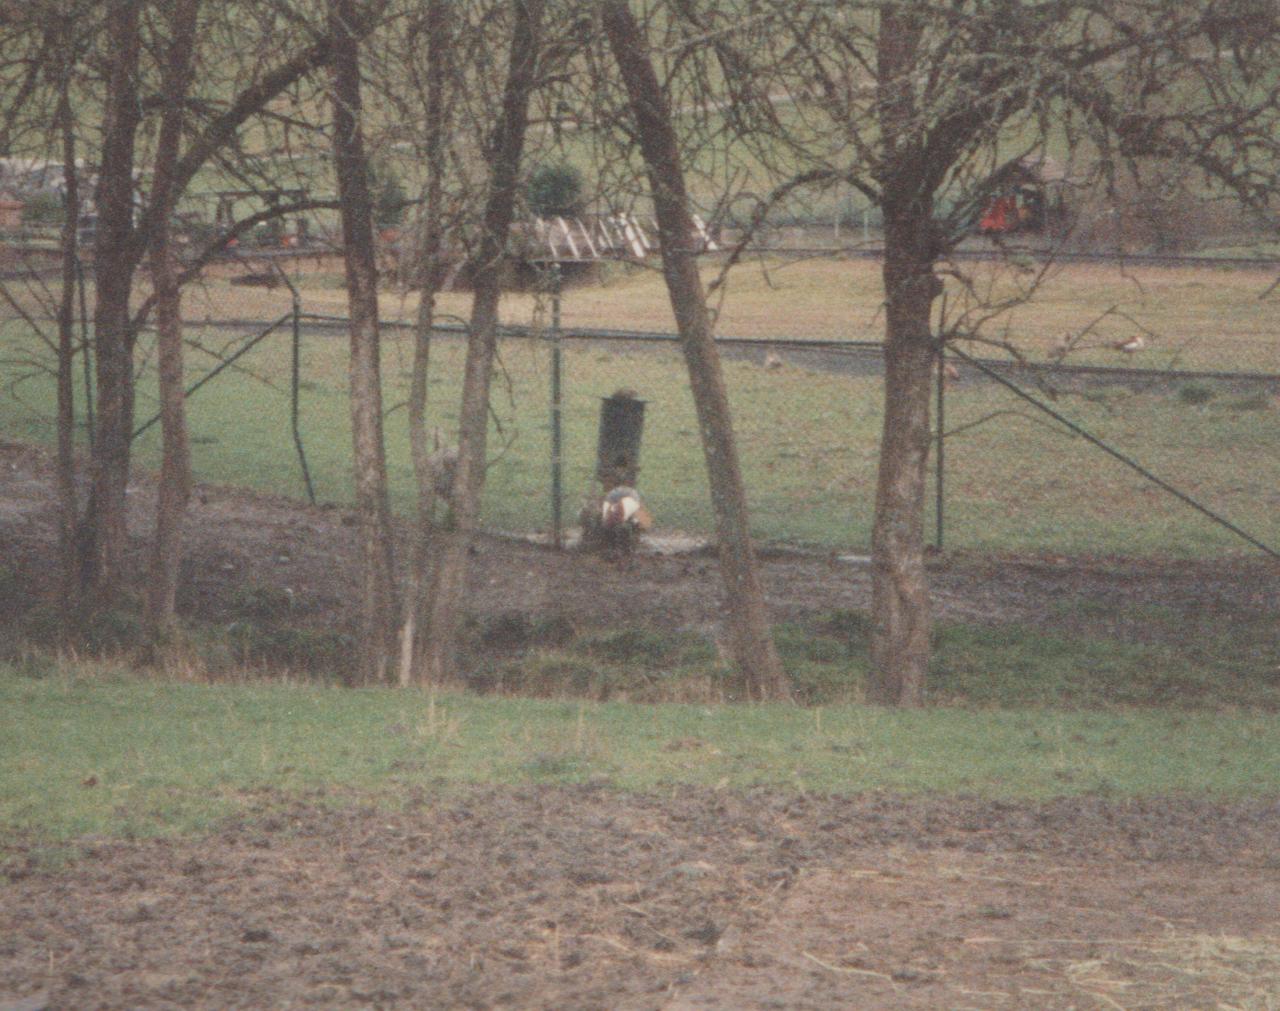 1992-12-26 - Saturday - Wildlife Safari Trip, Marilyn, Crystal-06.png